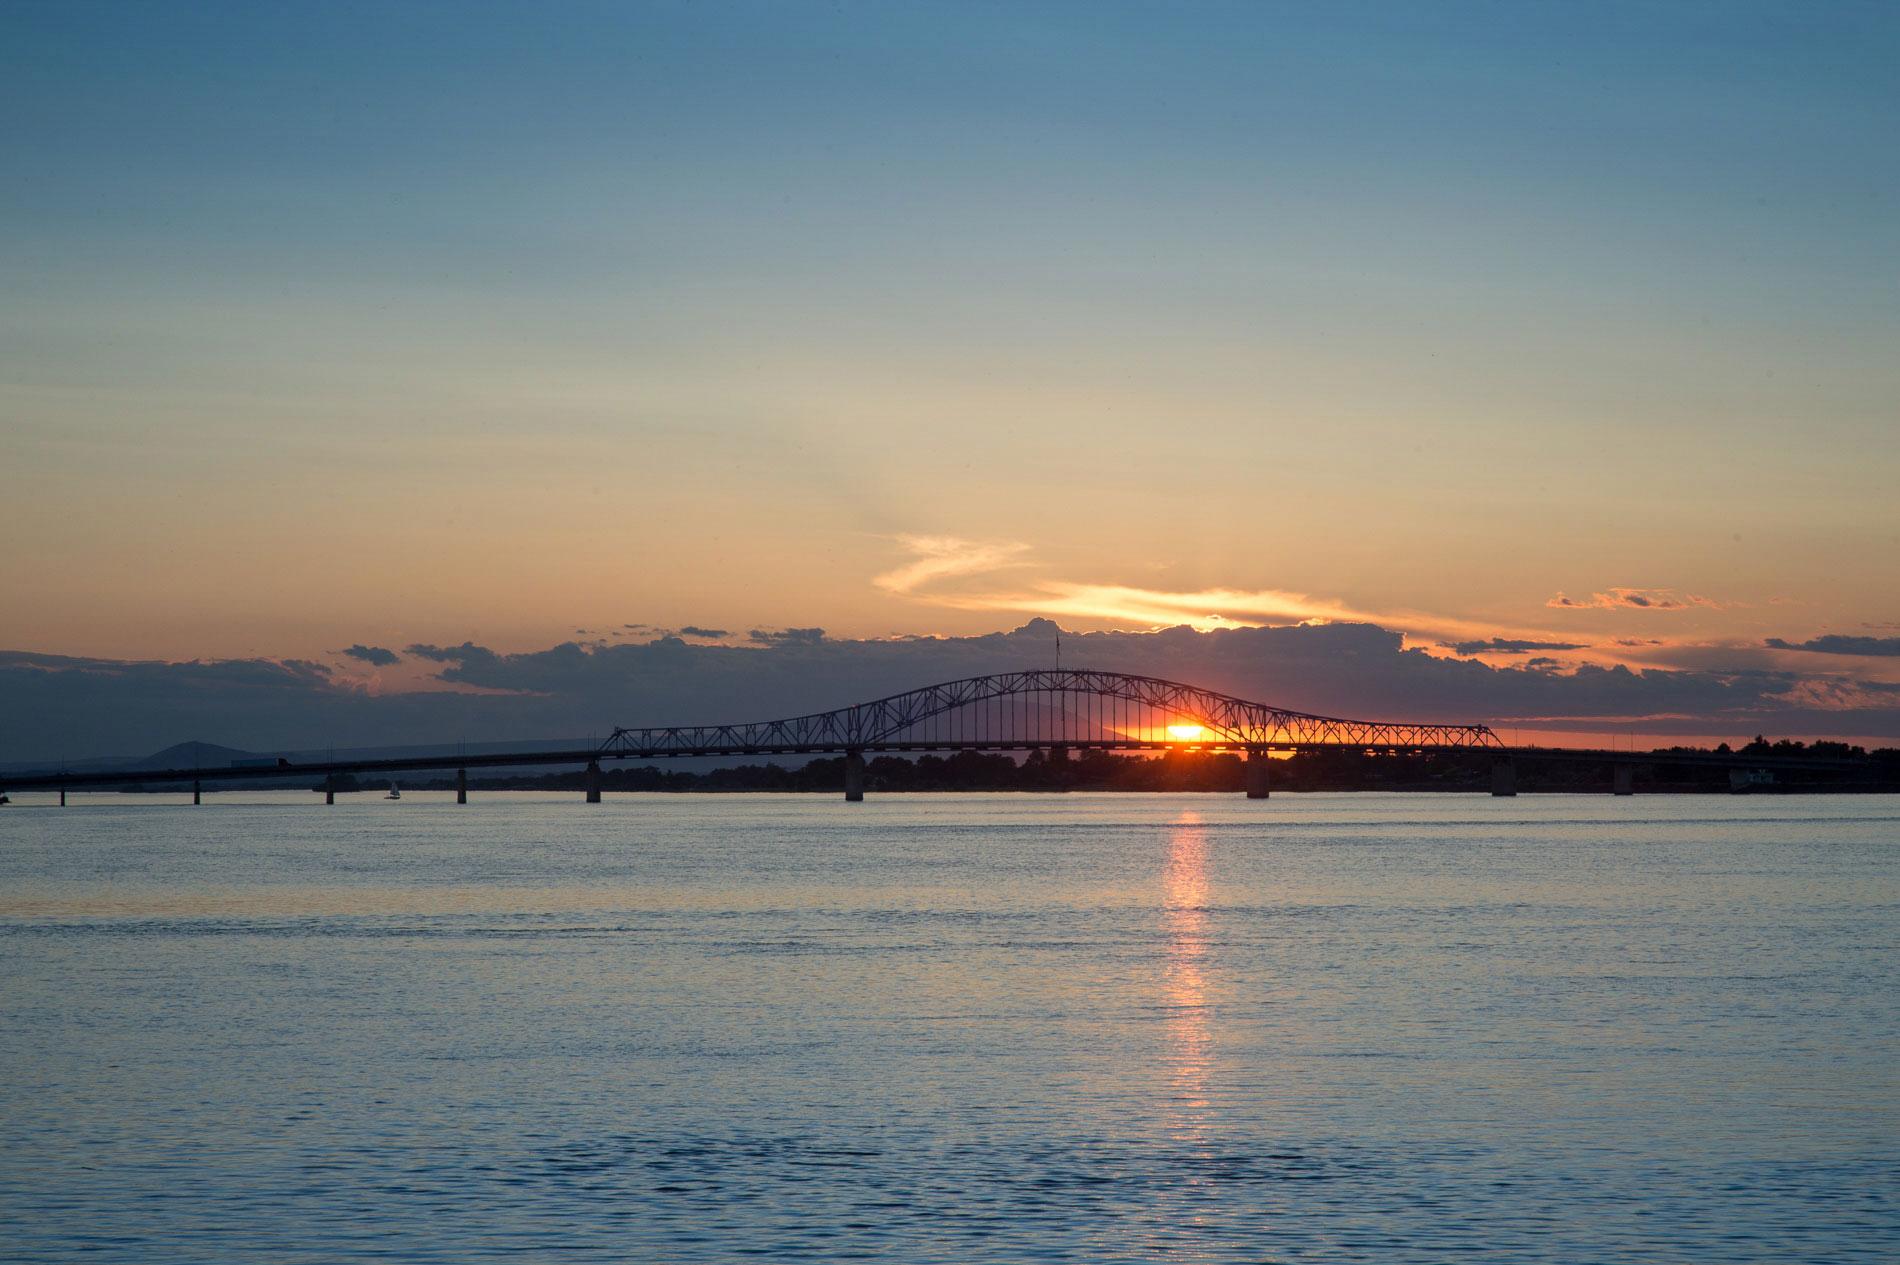 Blue Bridge at Sunset